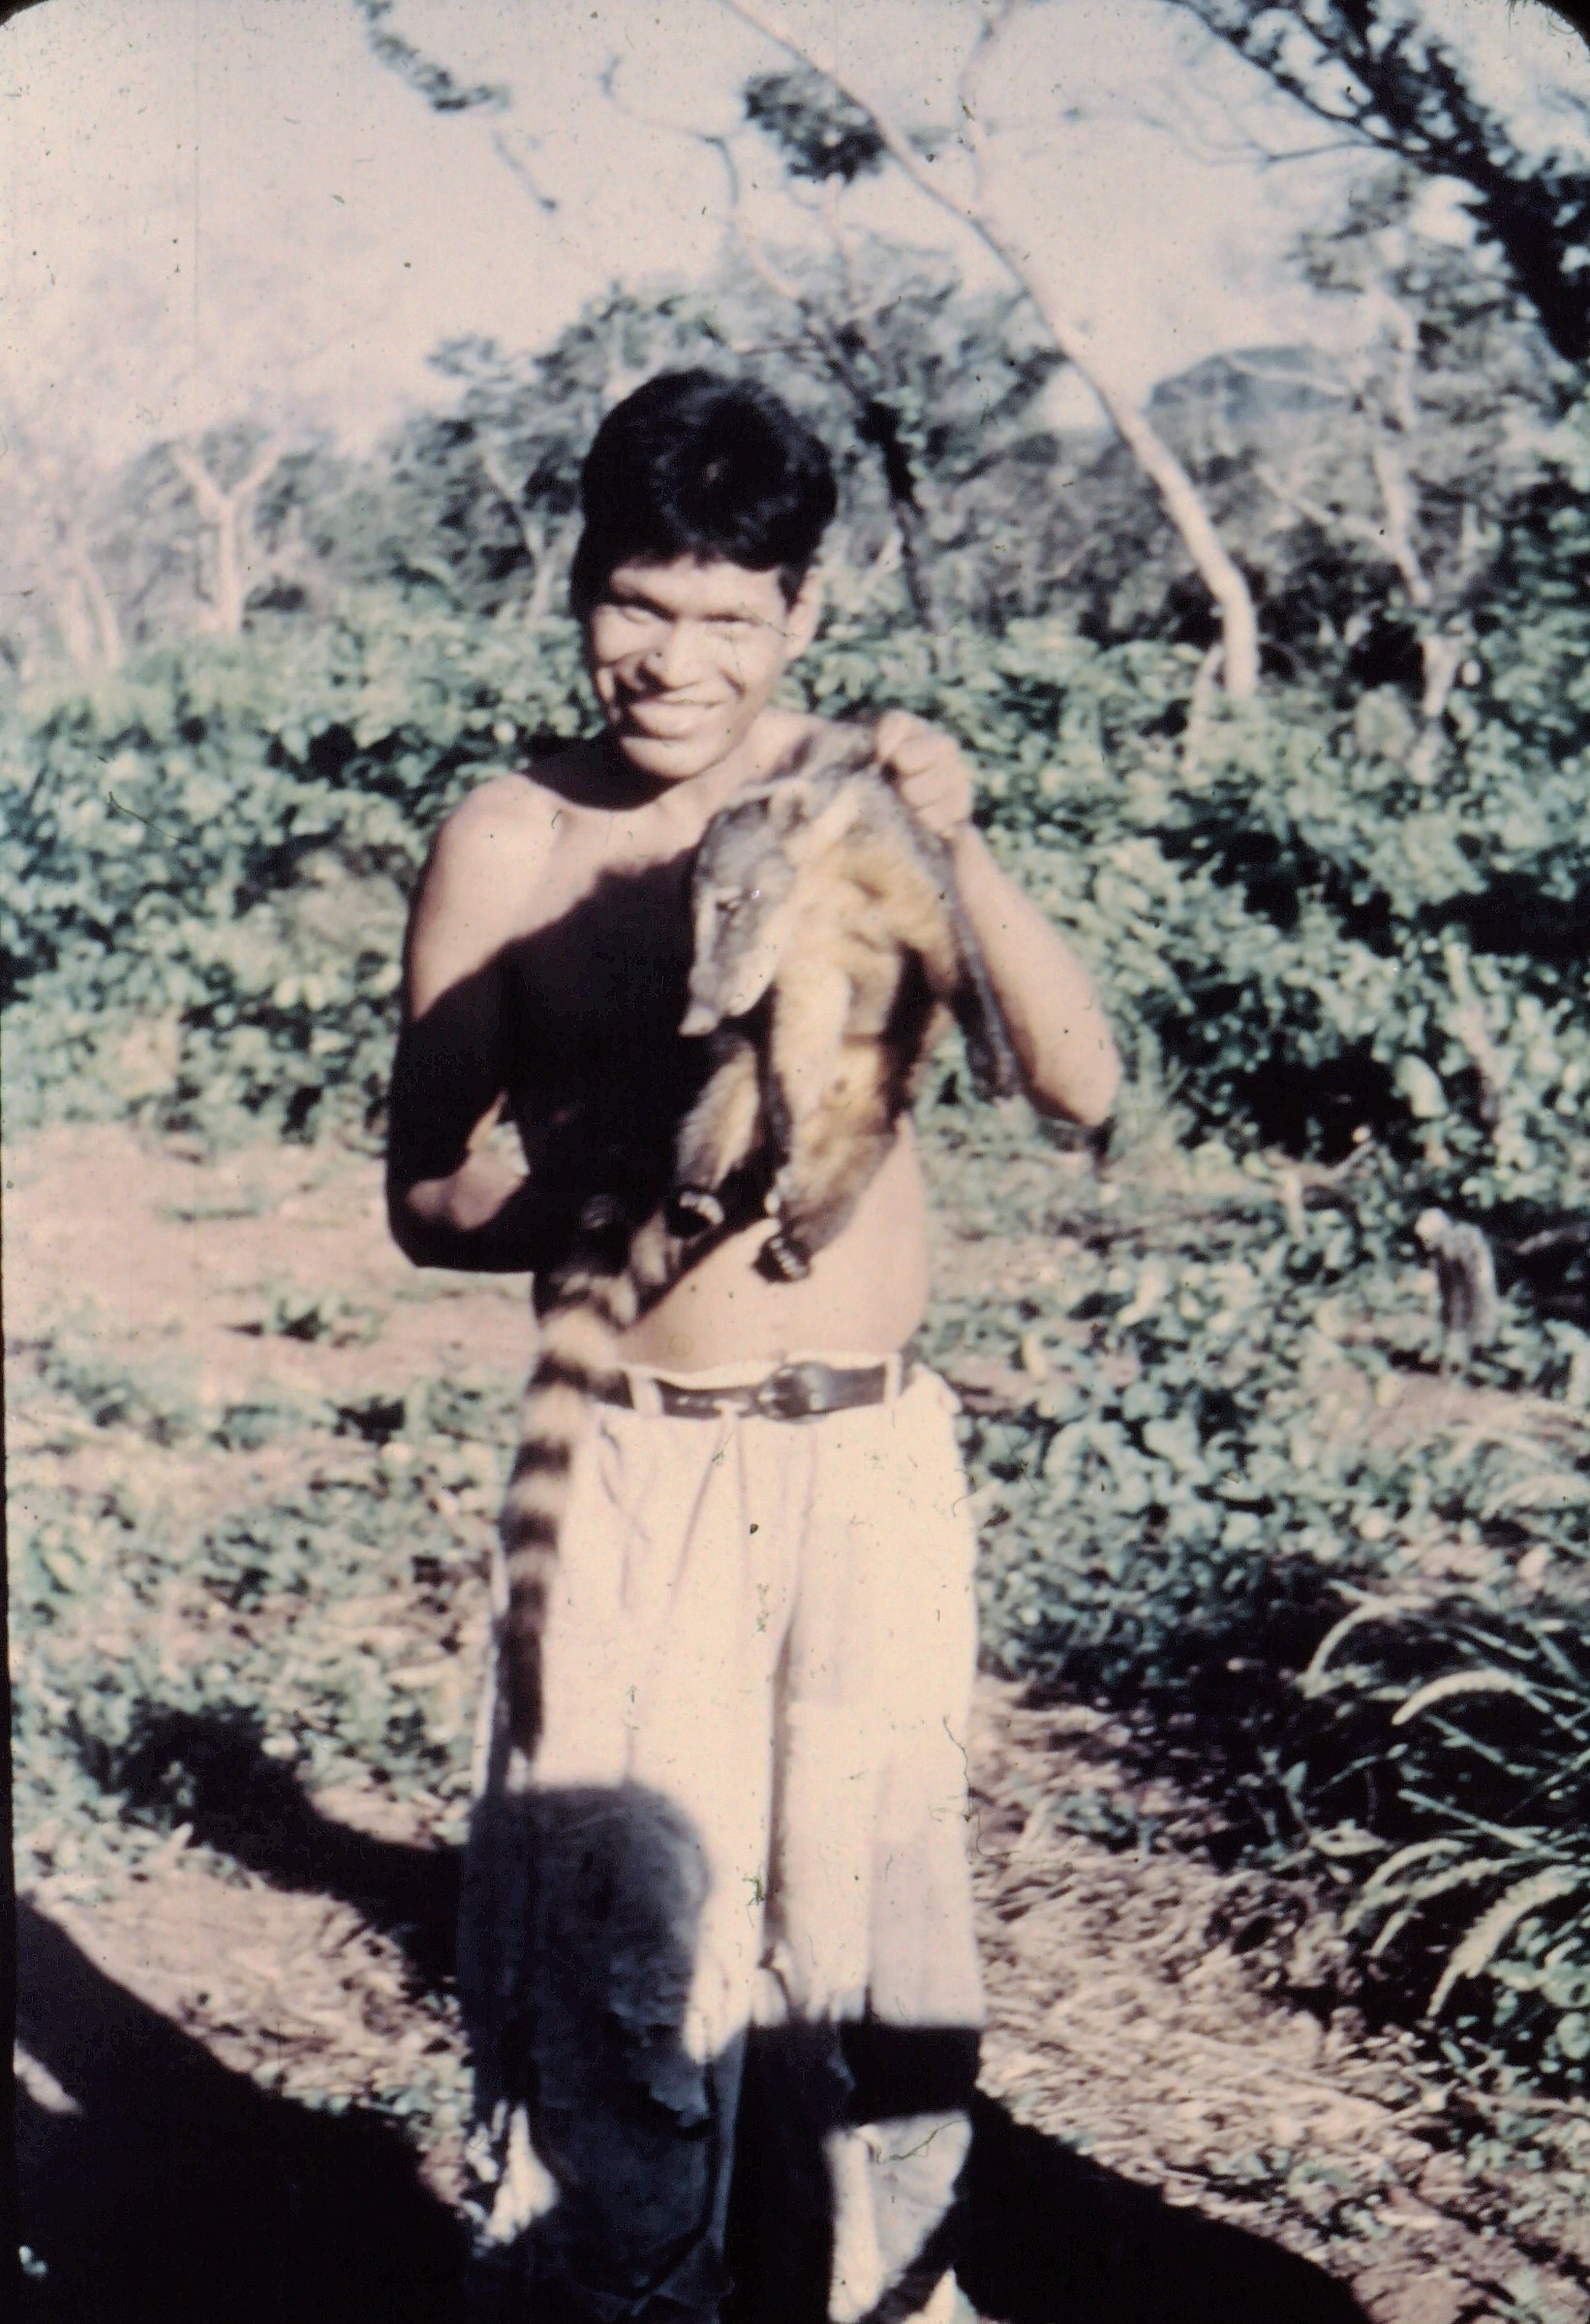 Ayoré man captures a small badger-like animal.